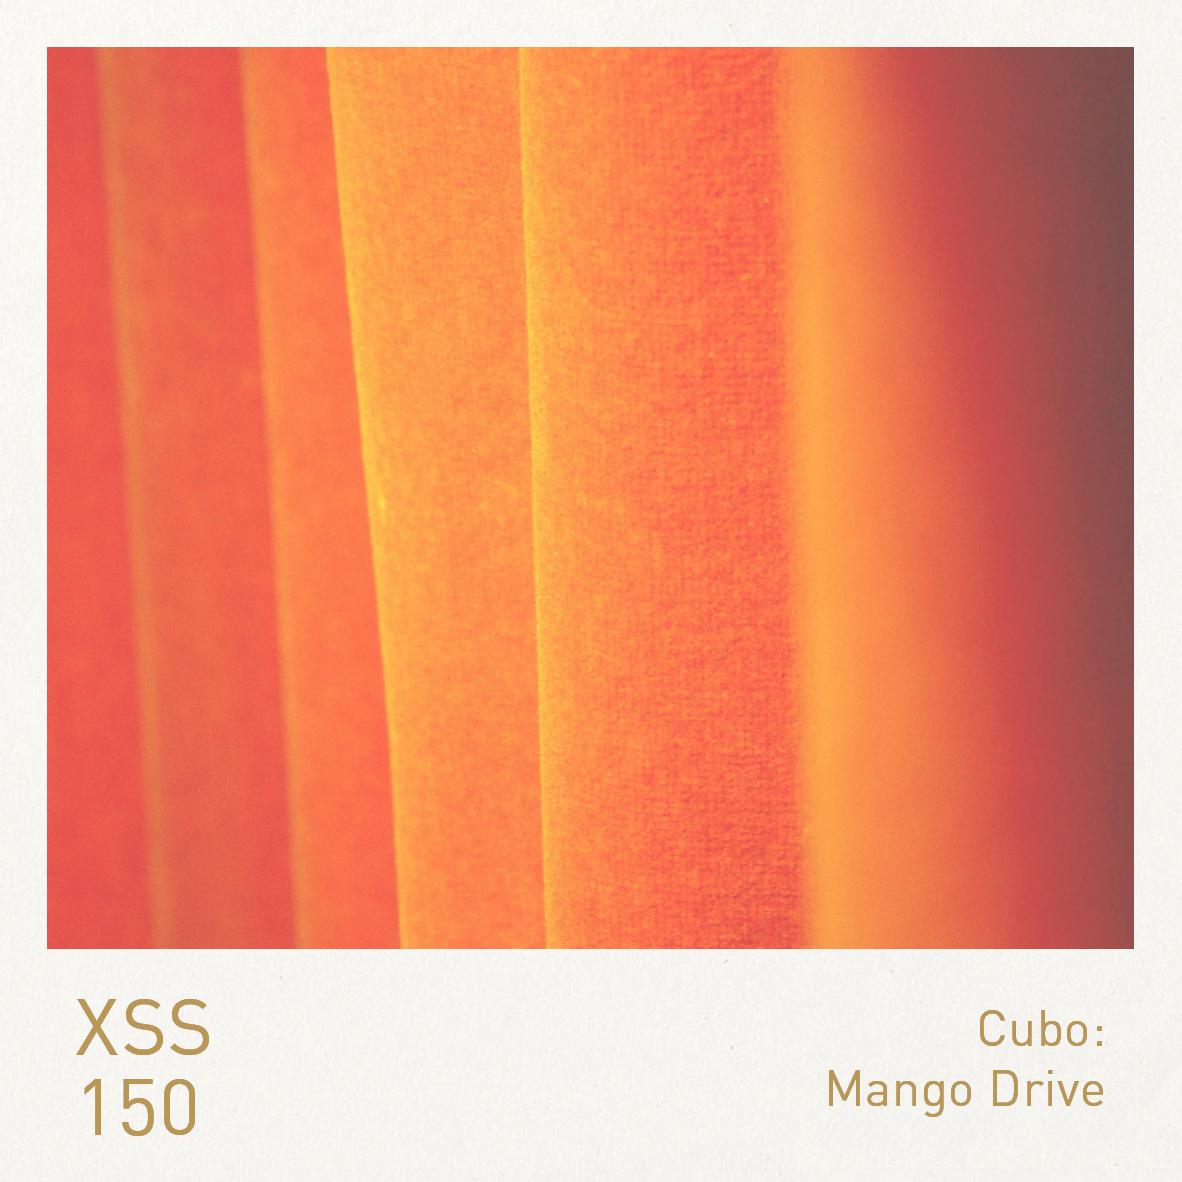 XSS150   Cubo   Mango Drive